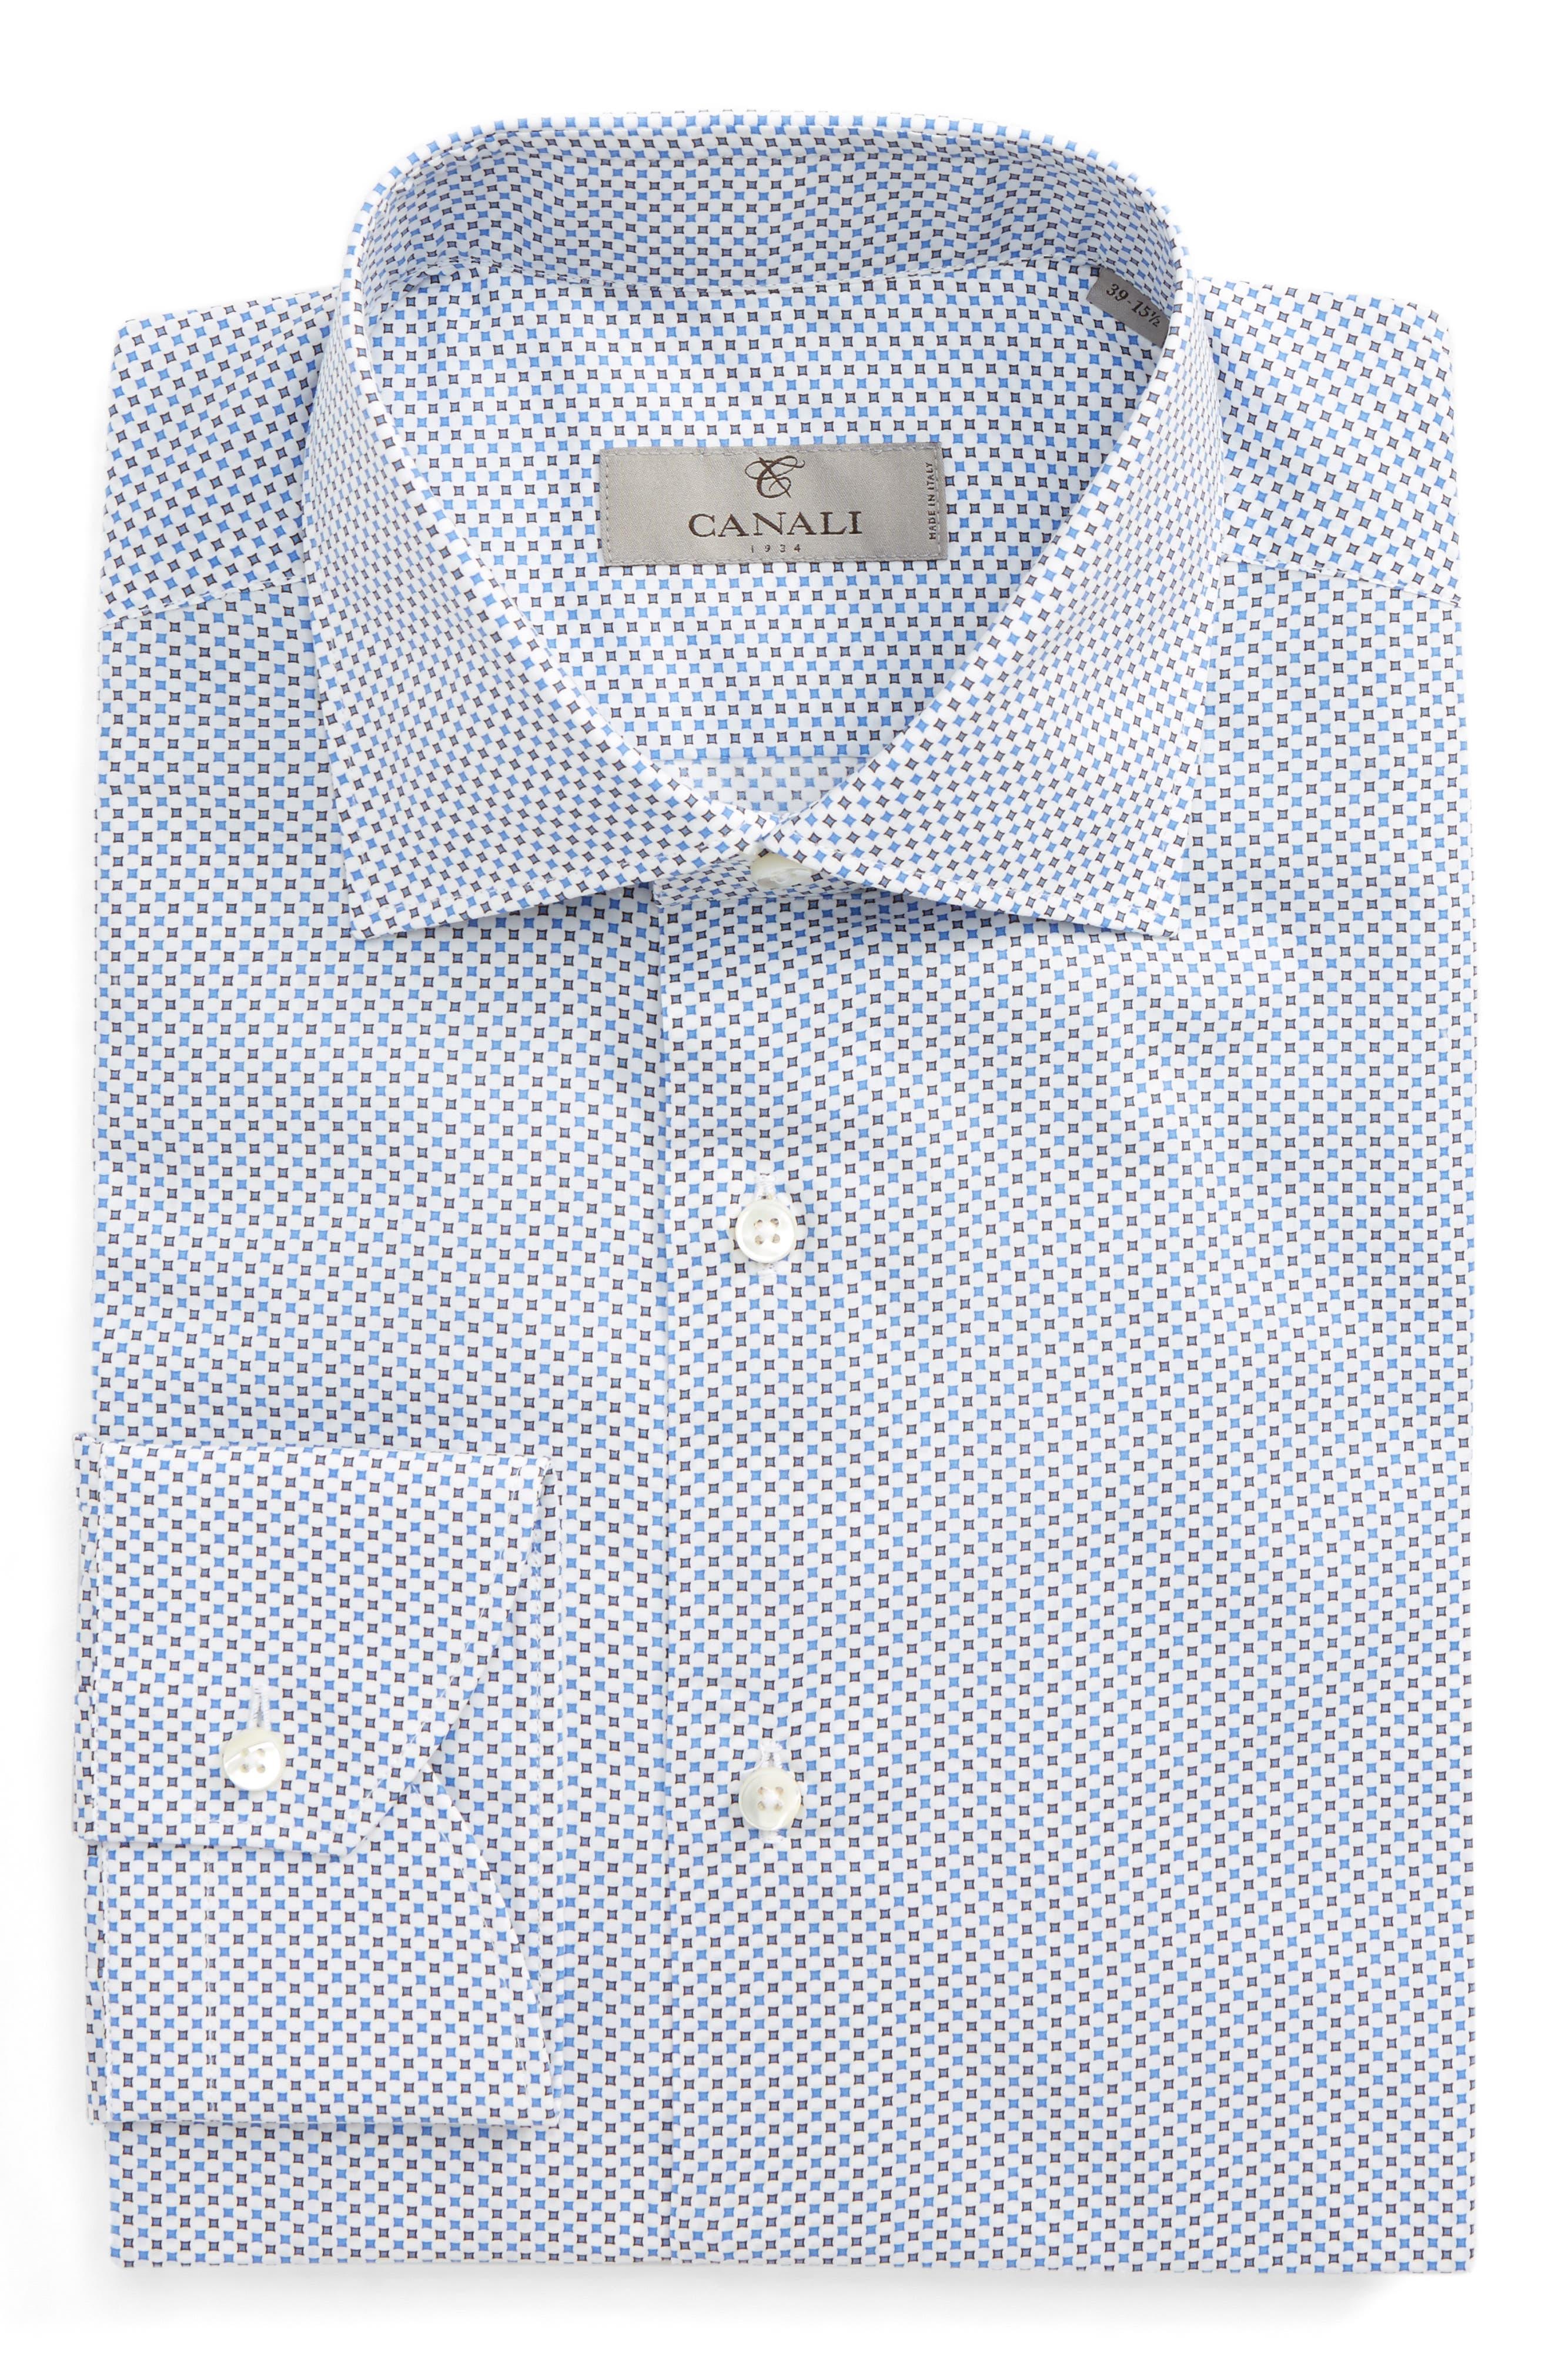 Regular Fit Print Dress Shirt,                         Main,                         color, Light Blue